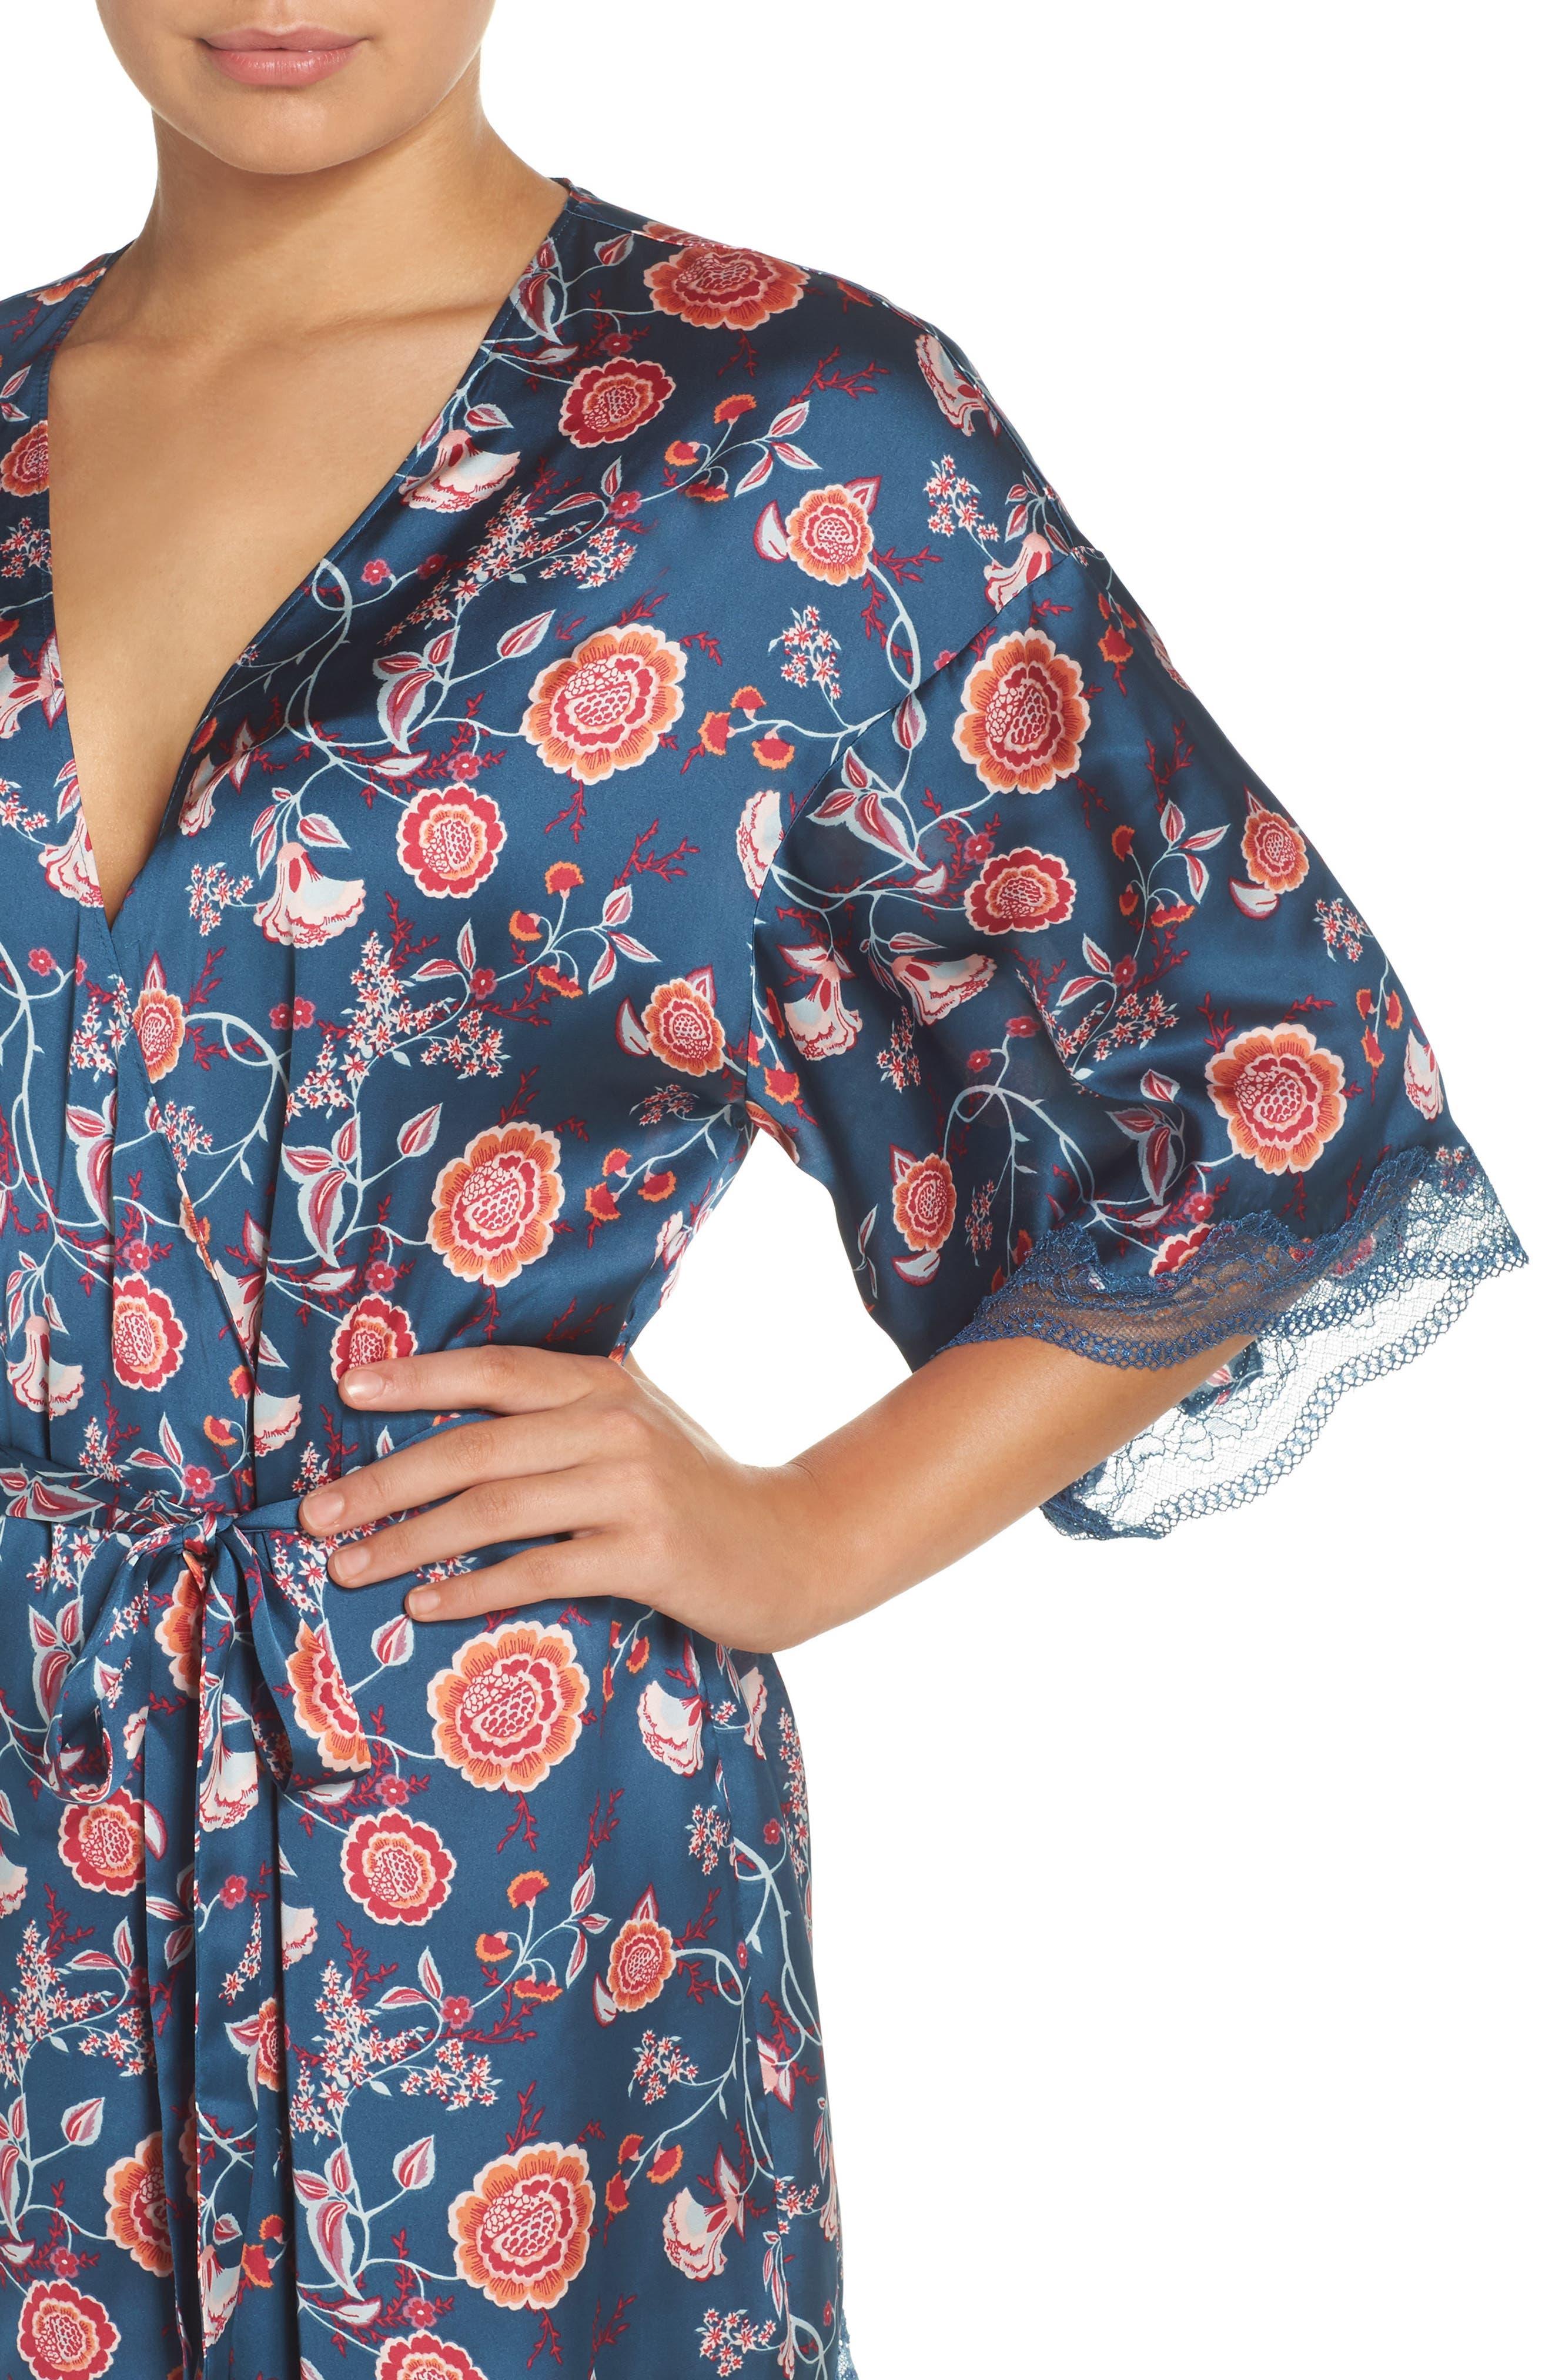 Floral Print Satin Kimono,                             Alternate thumbnail 5, color,                             Blue Ceramic Vintage Floral